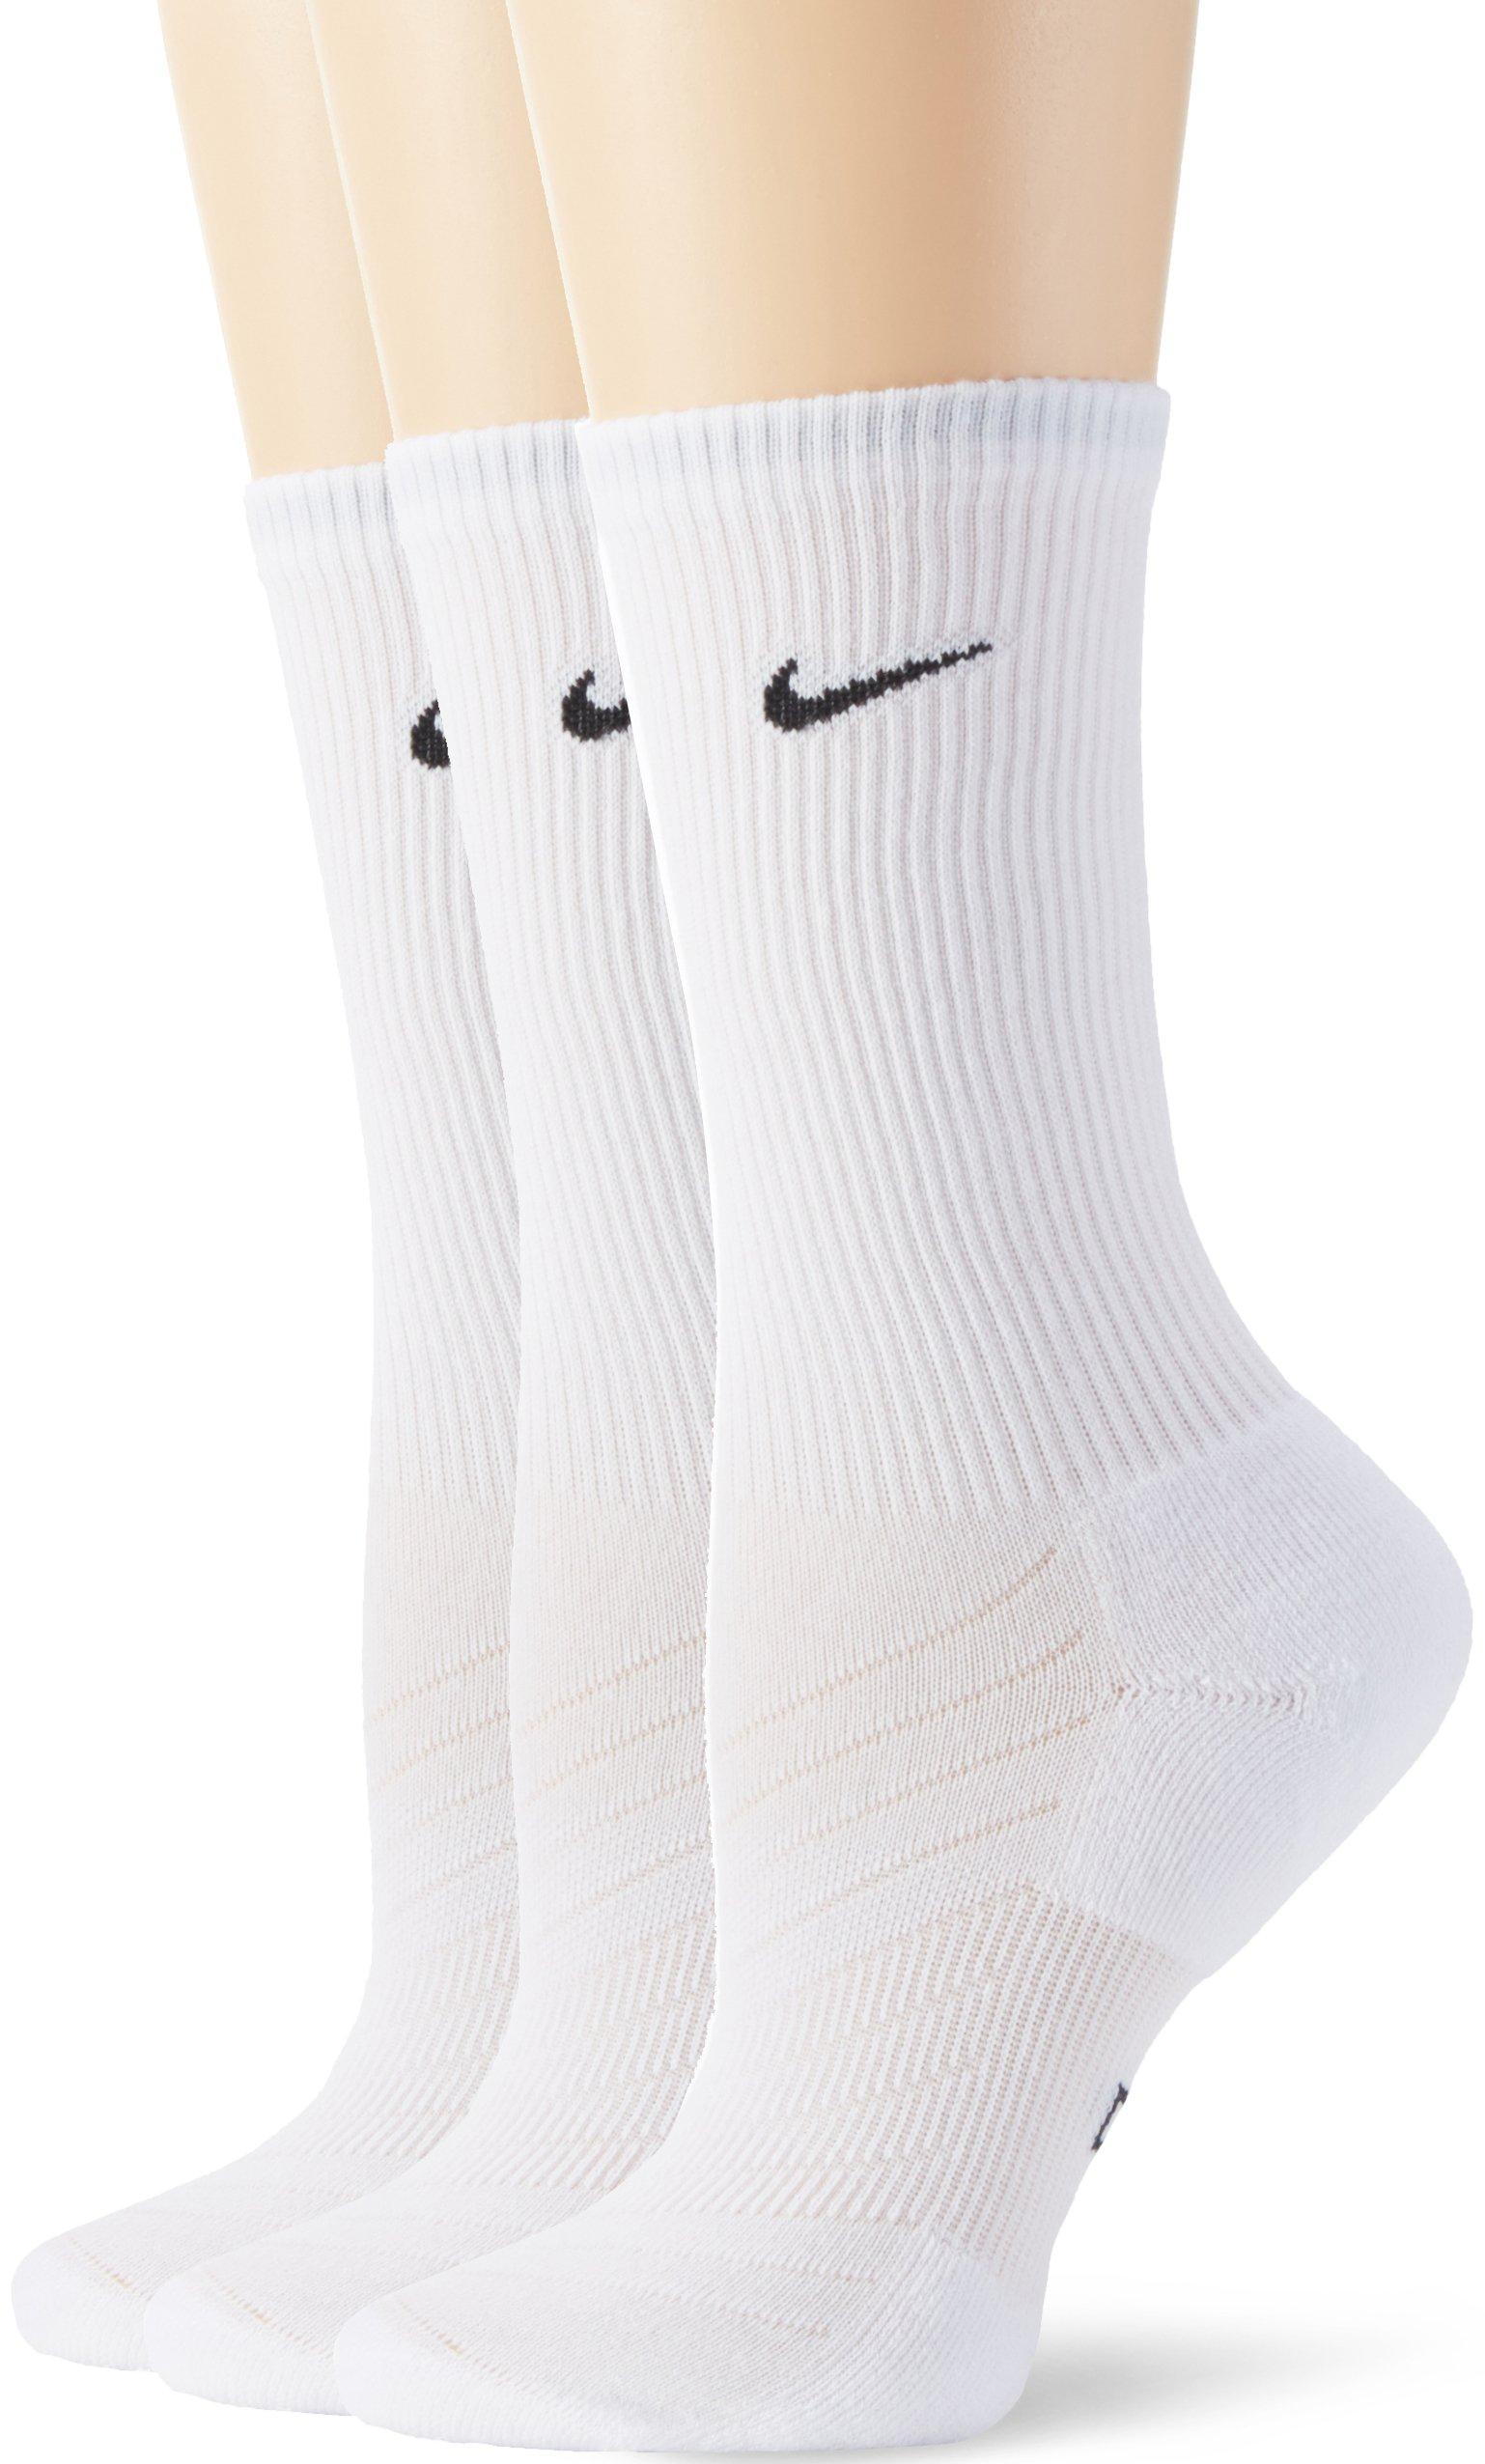 Nike calze, lunghezza a 3/4�3, Unisex, 3/4 Length Socks 3, bianco, L